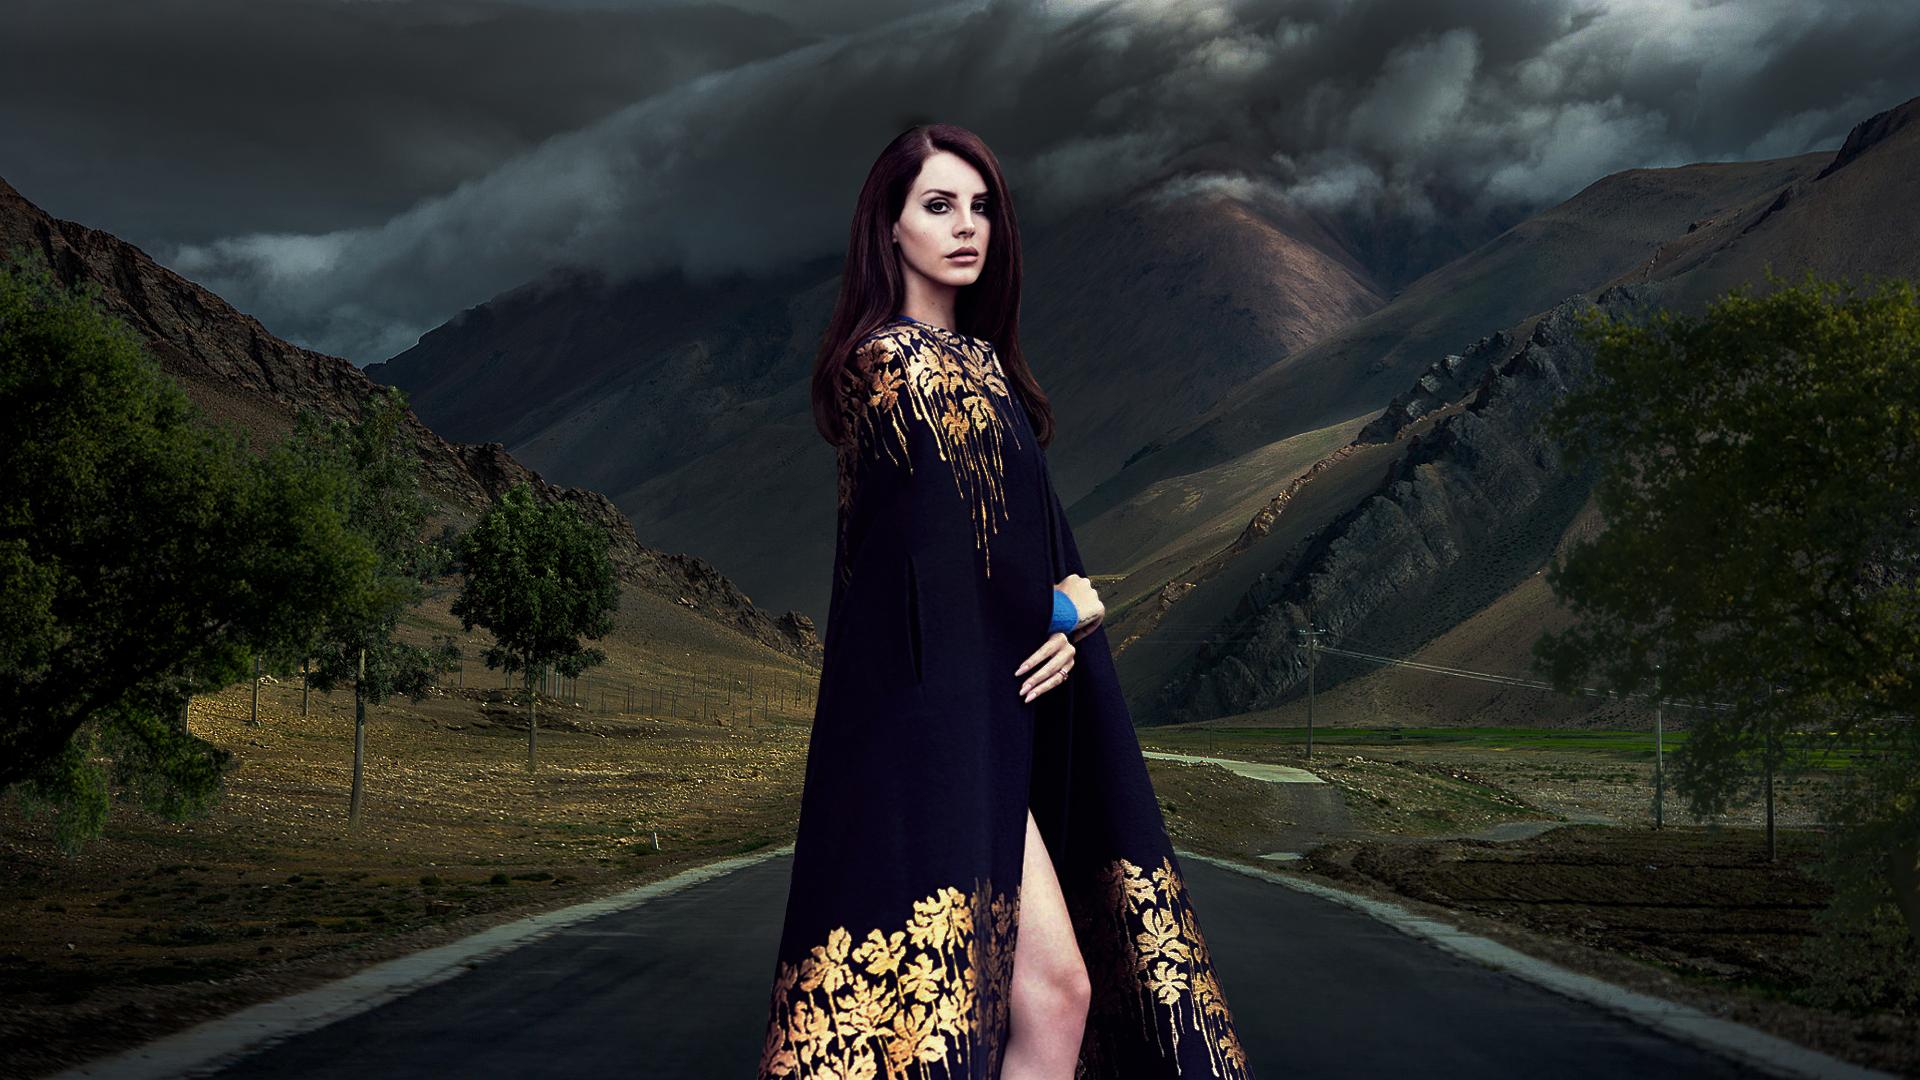 Lana Del Rey mountain wallpaper